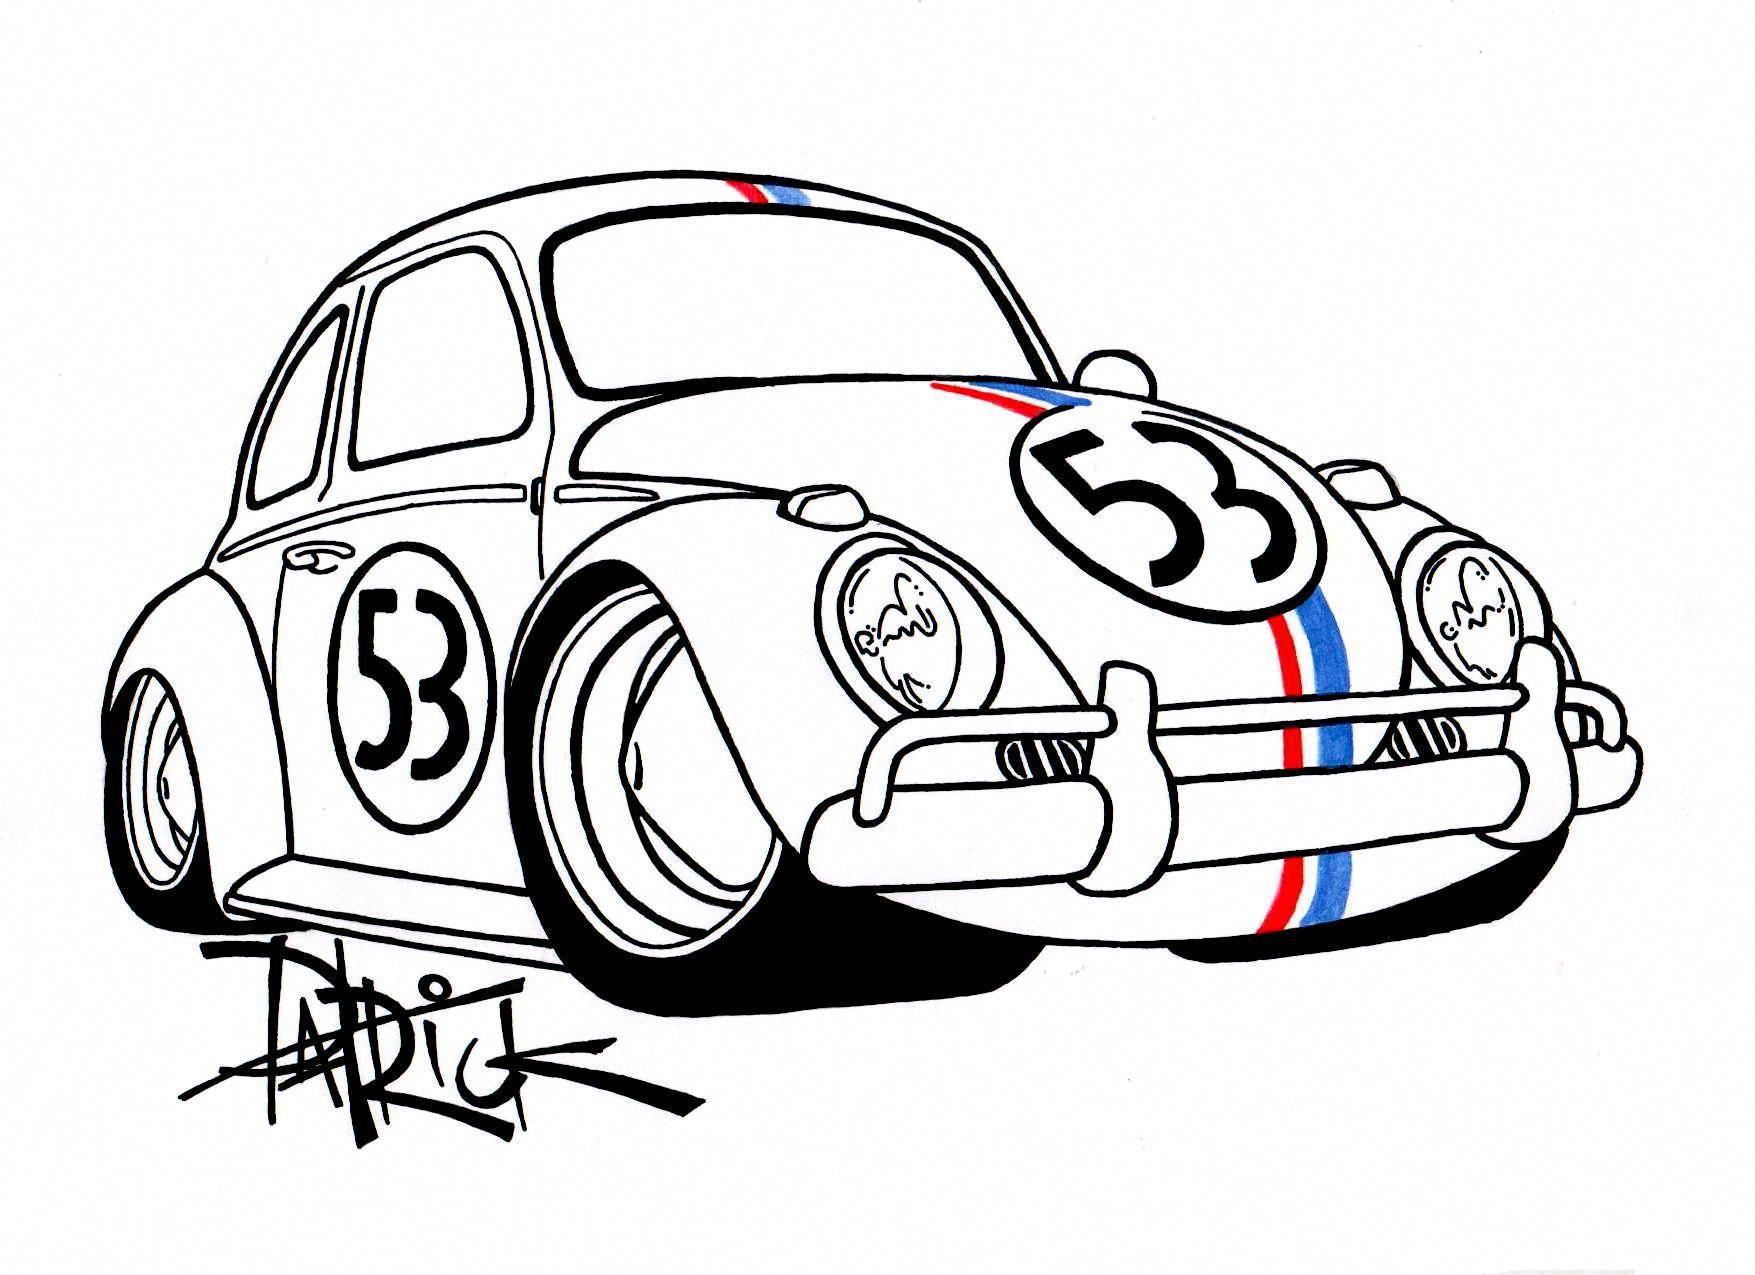 Volkswagenpoloaccessories Desenhos De Fusca Desenhos De Carros Adesivos Para Carros